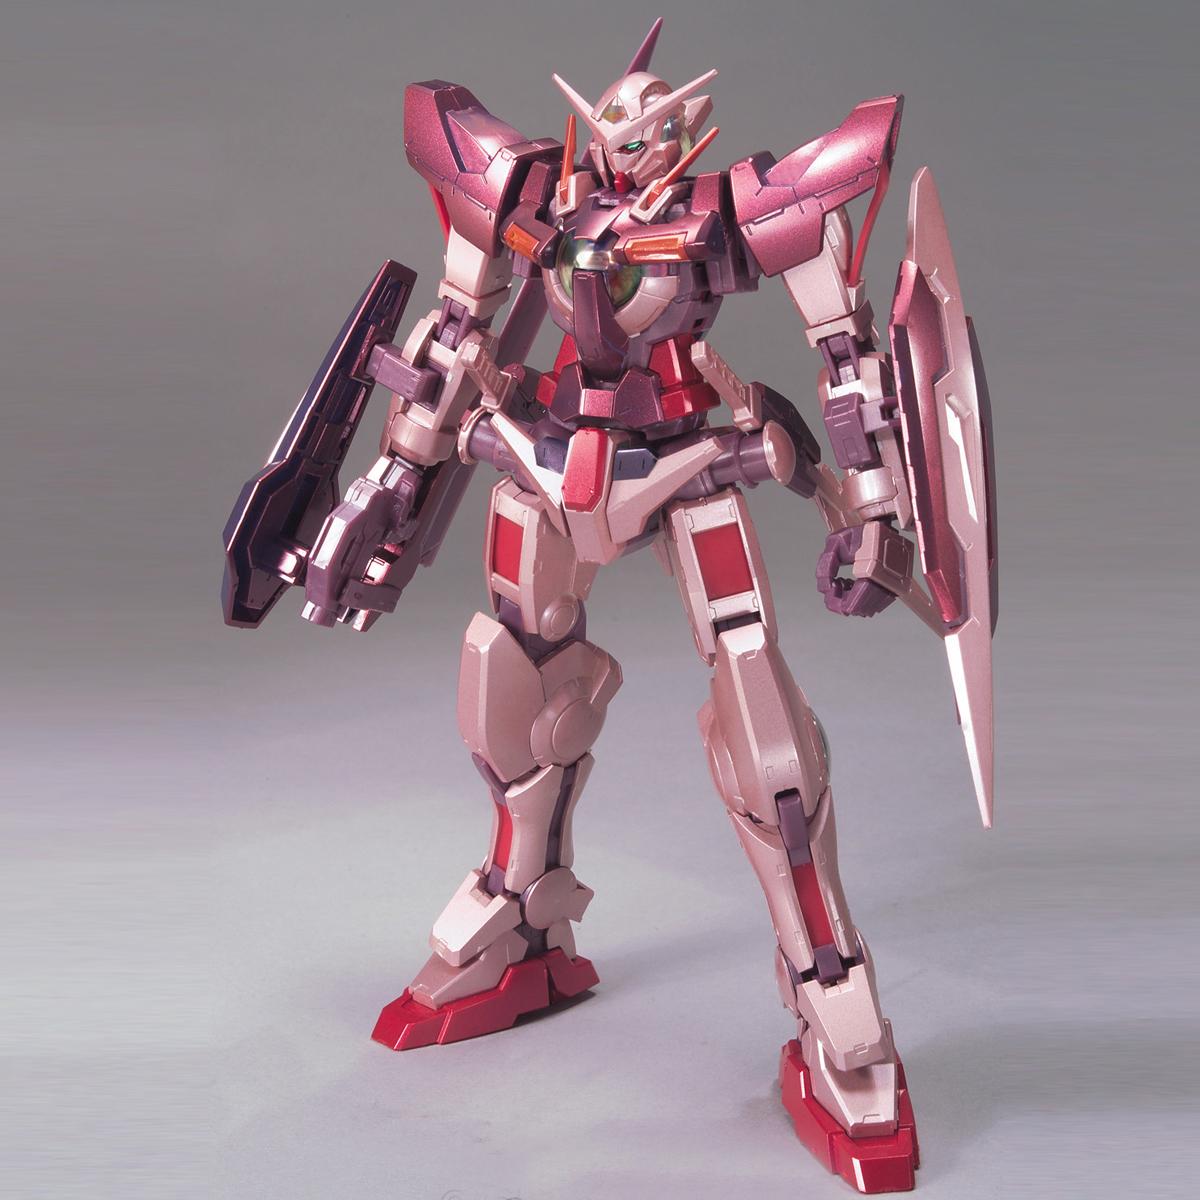 889661/100 GN-001 ガンダムエクシア トランザムモード エクストラフィニッシュVer. [Gundam Exia (Trans-am Mode) EXF Ver.]